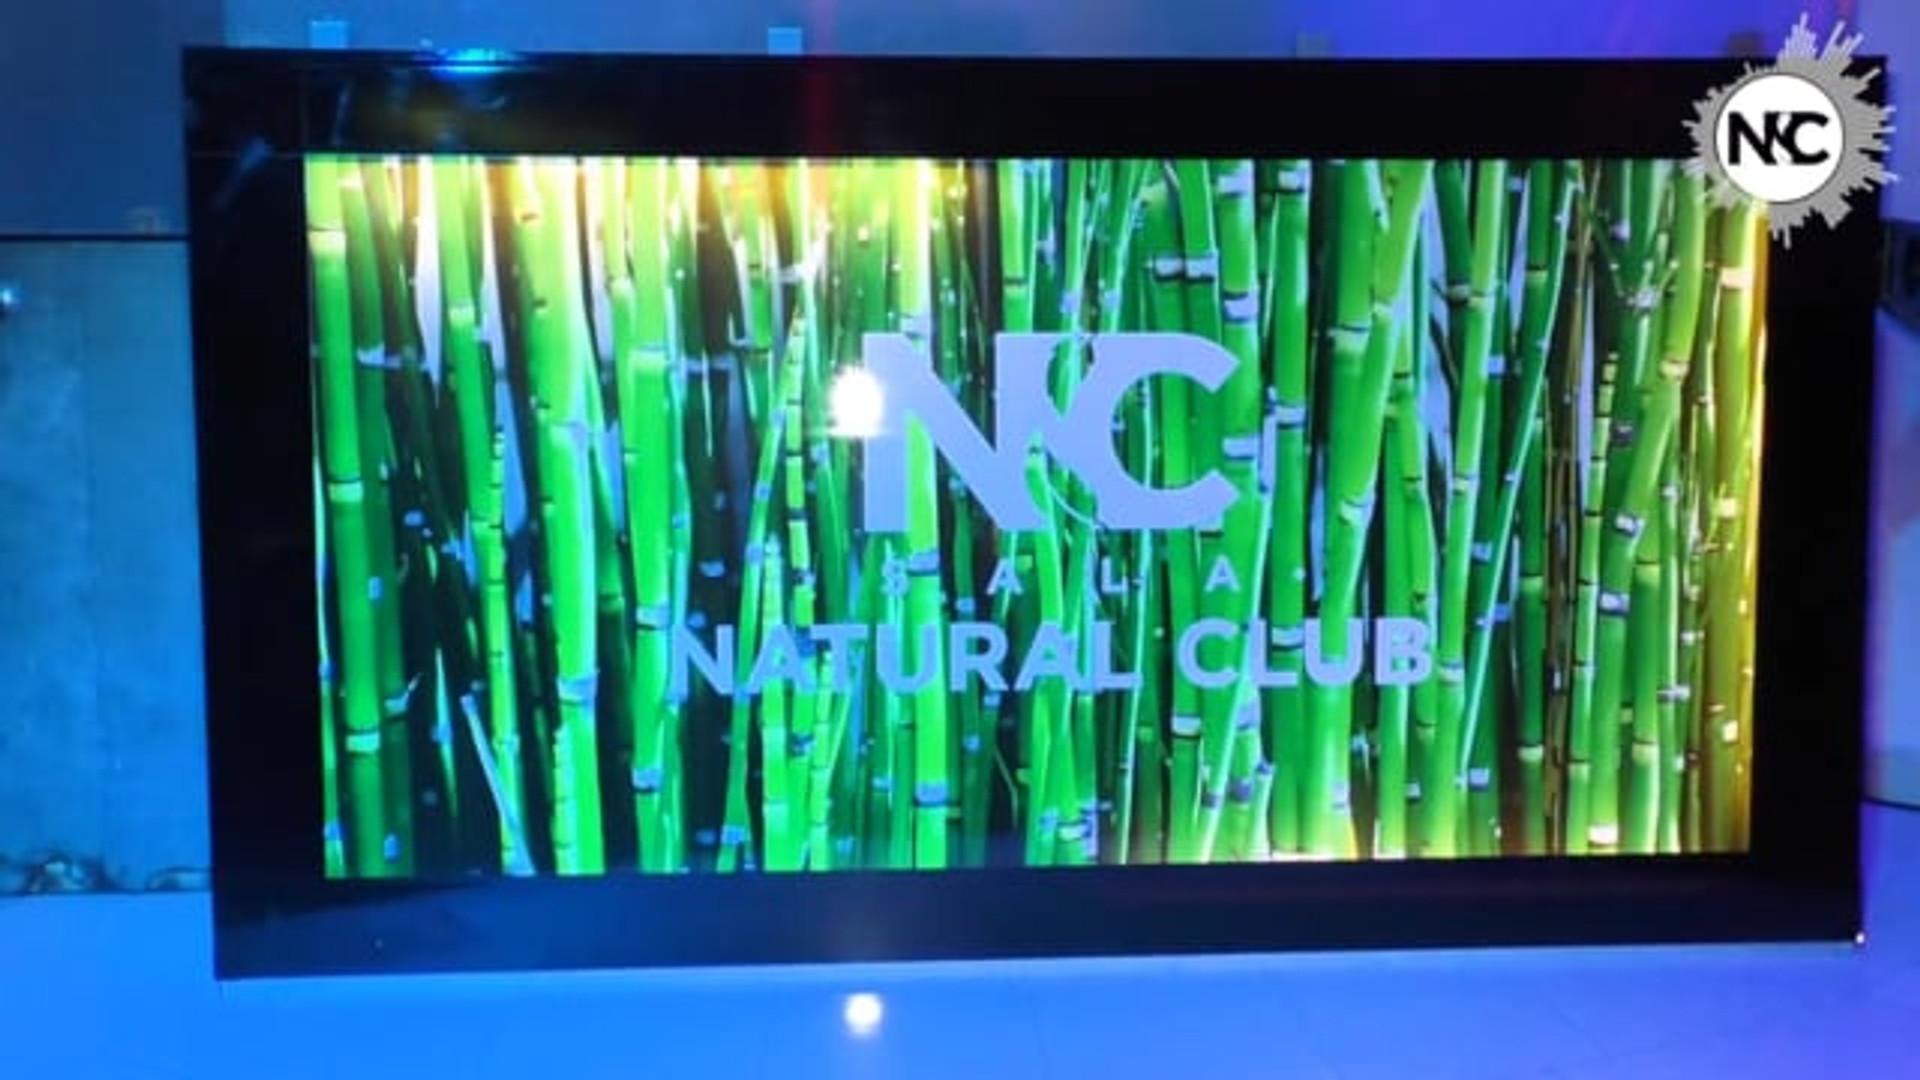 Sala Natural Club